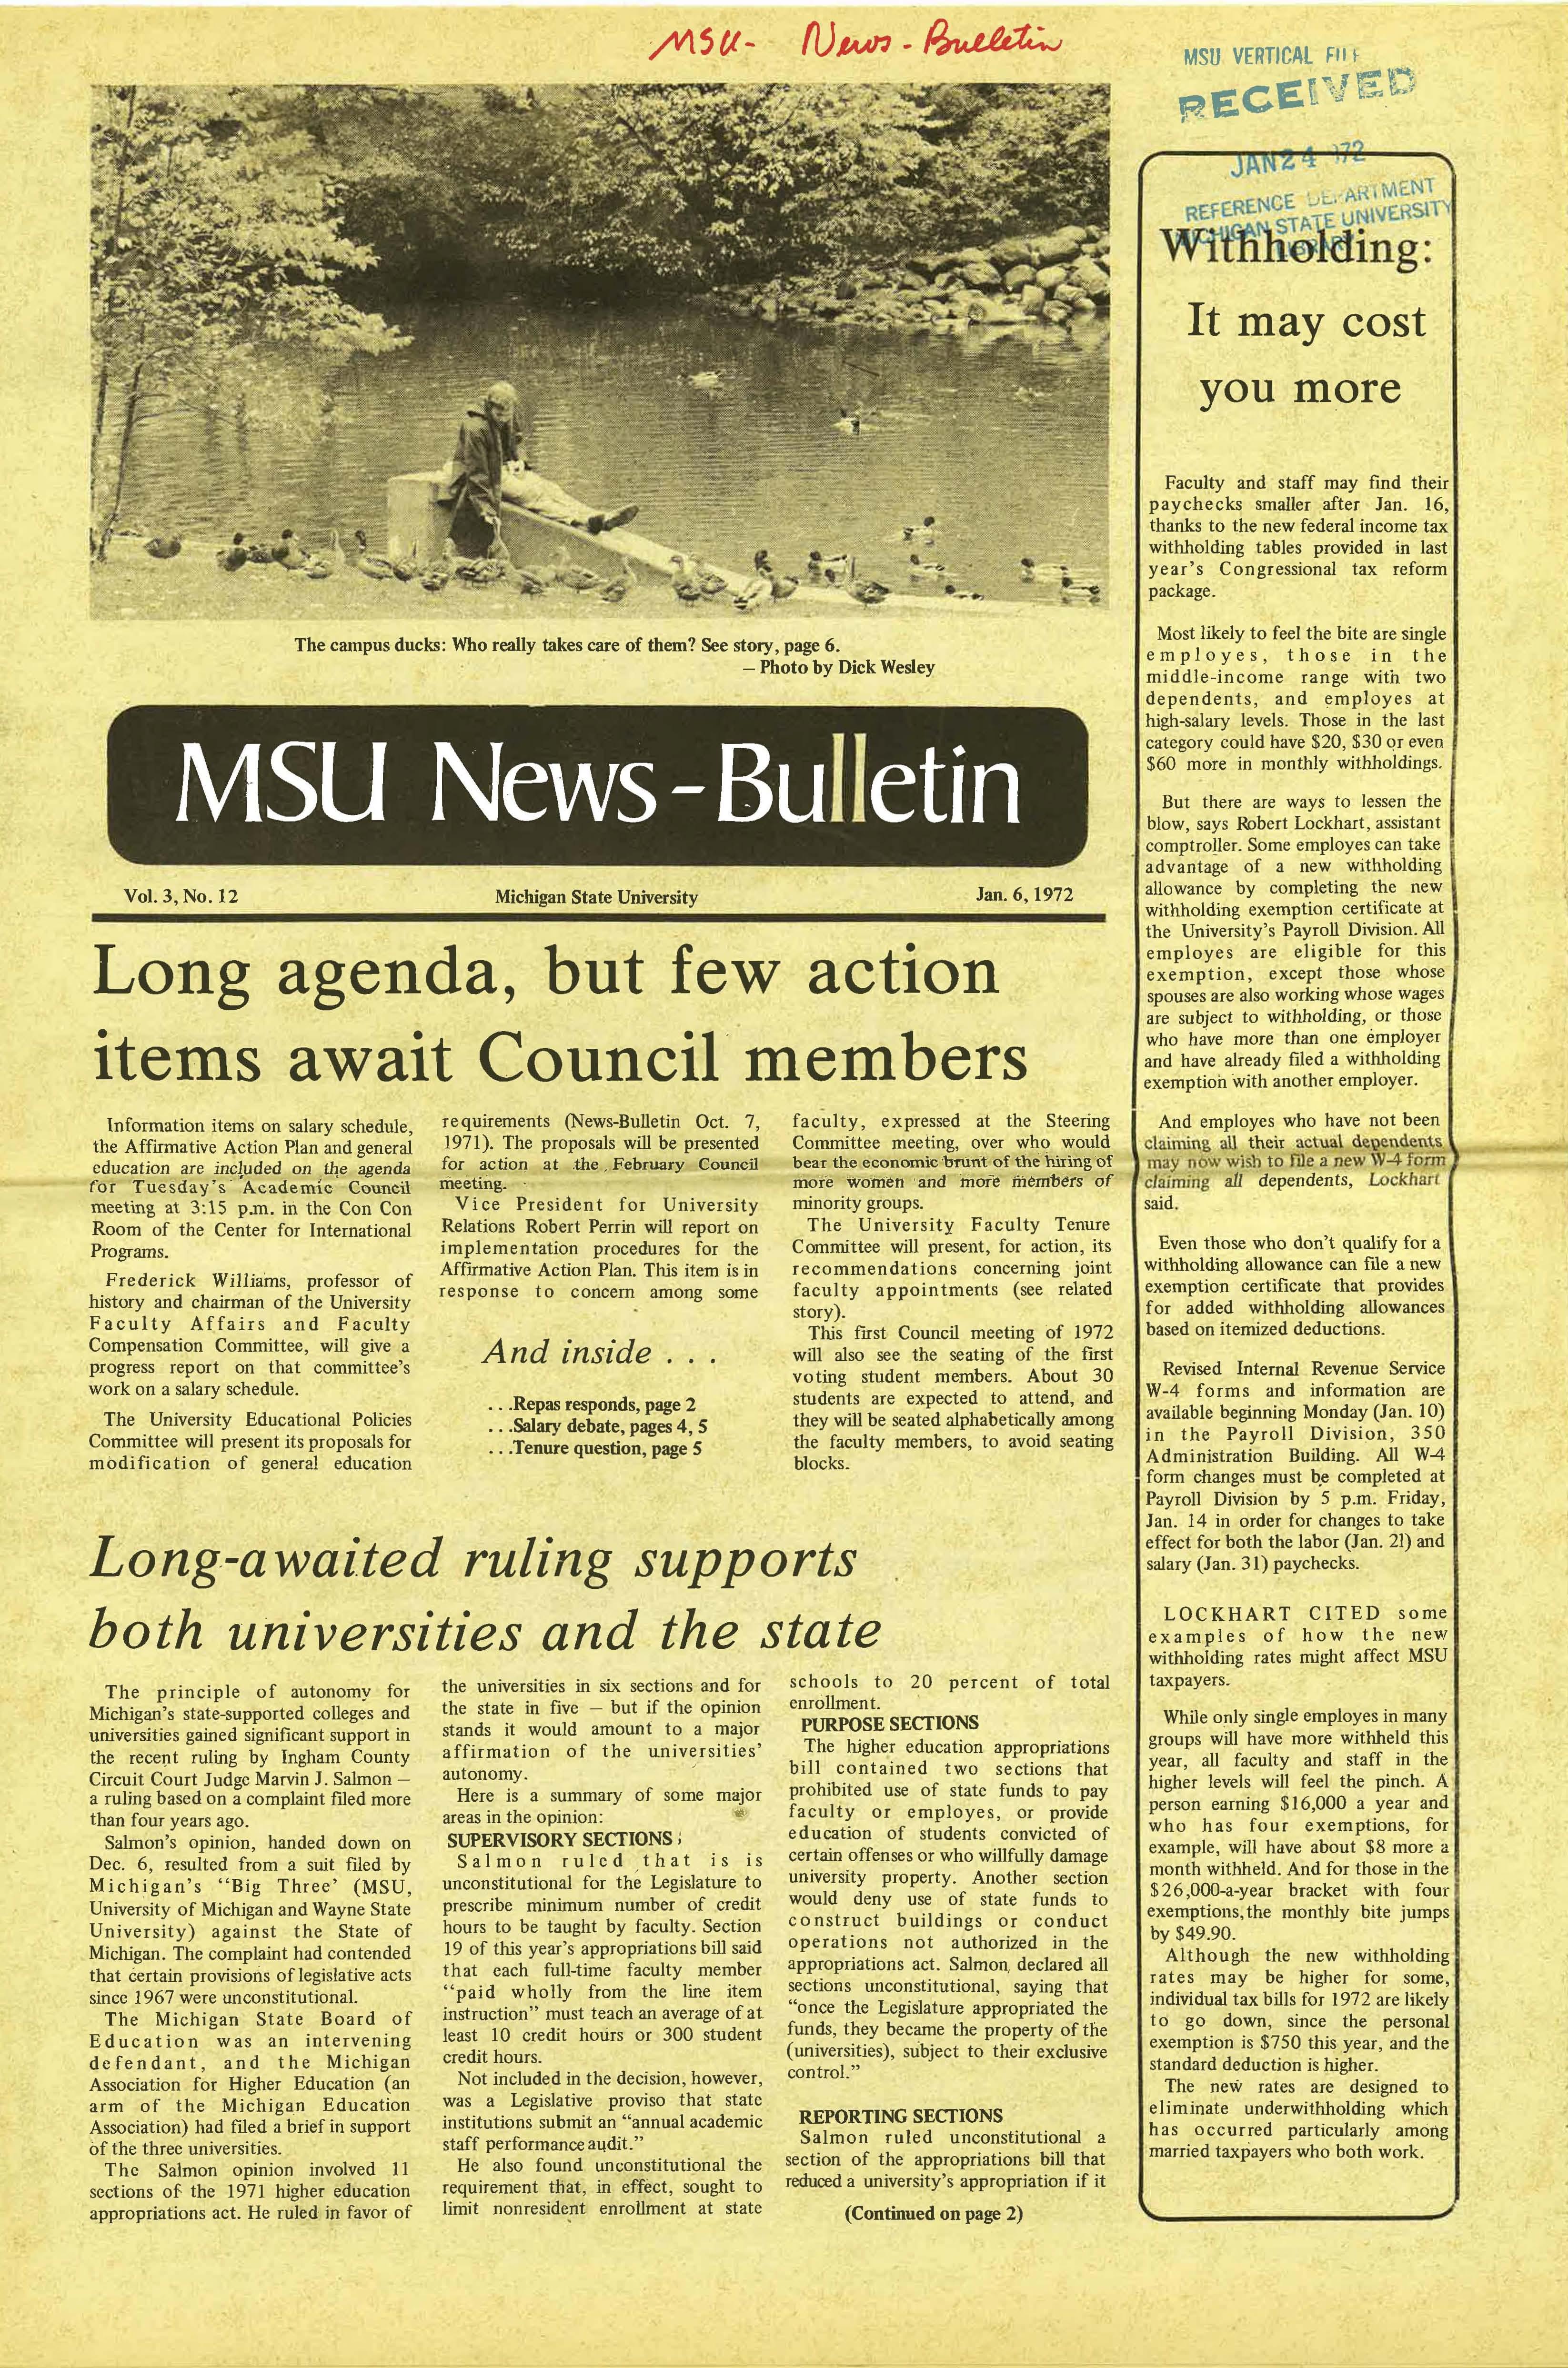 MSU News Bulletin, vol. 3, No. 20, March 2, 1972